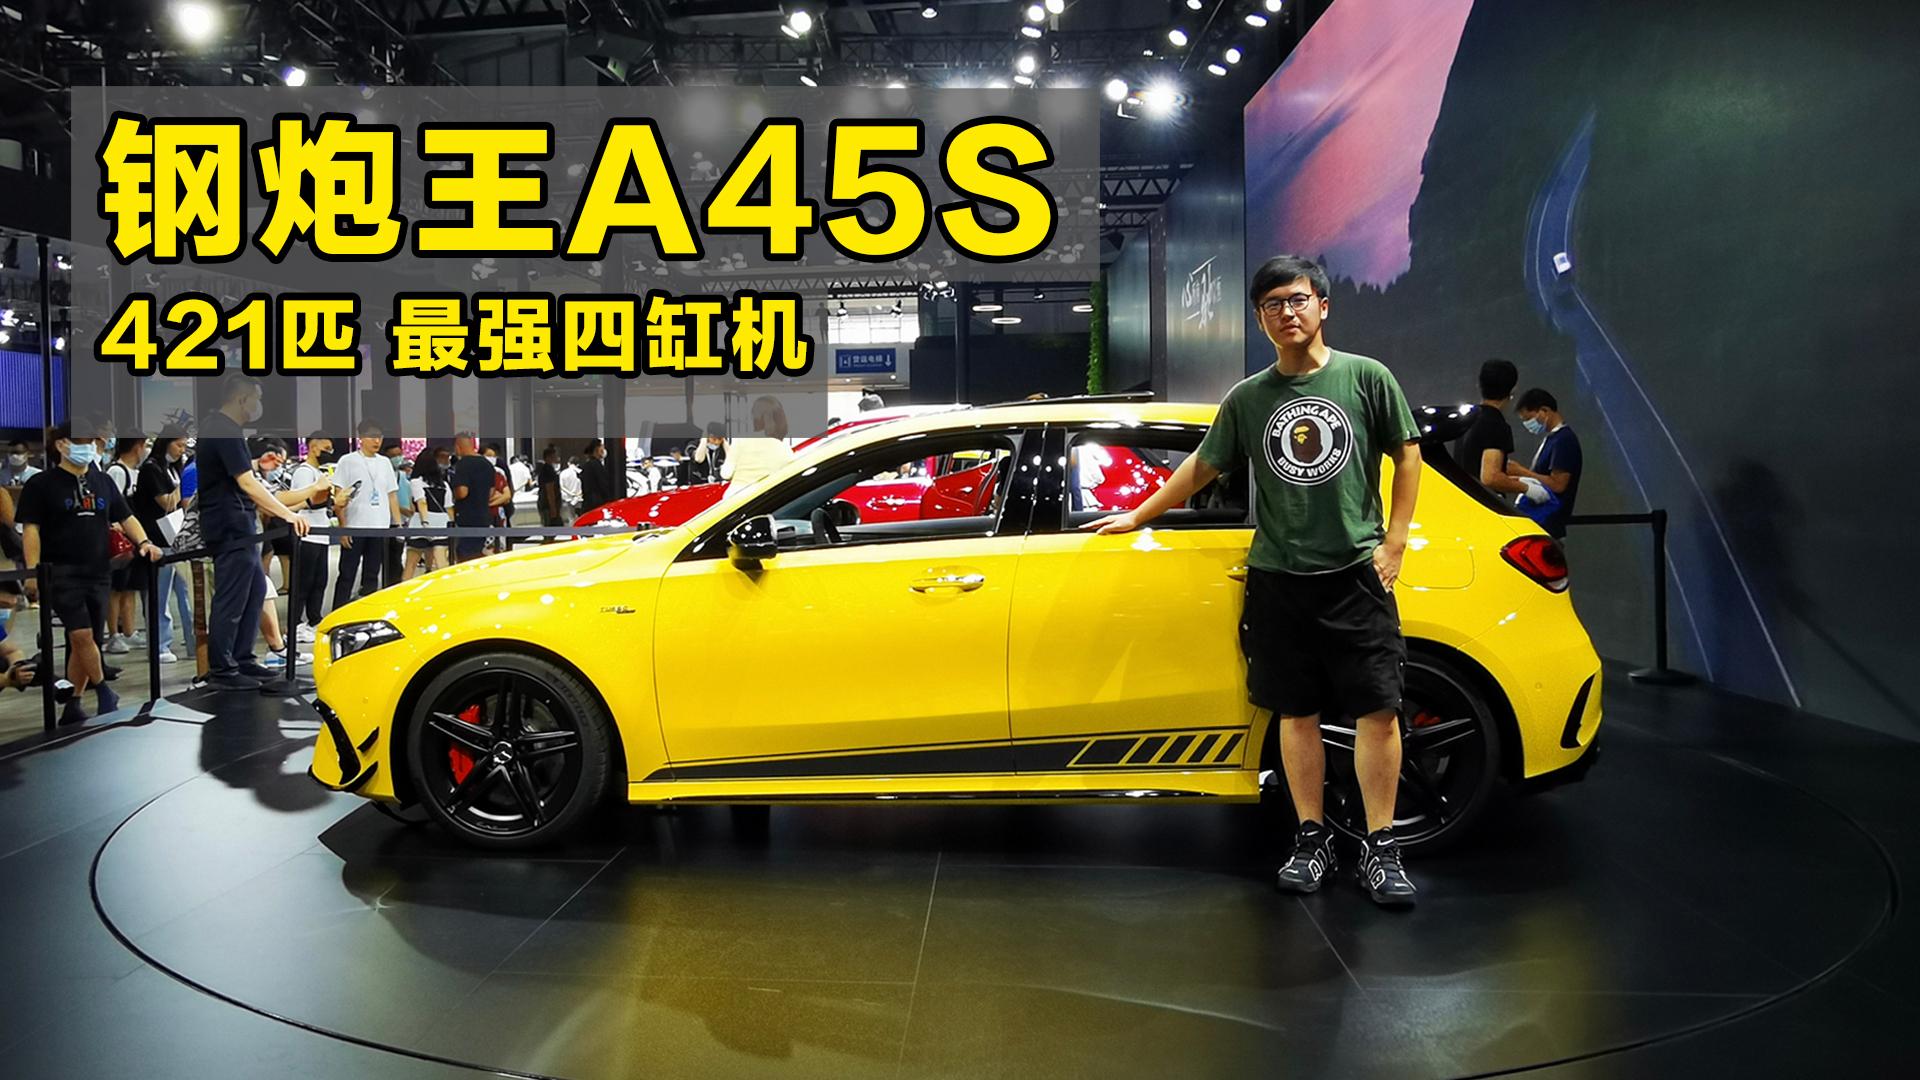 RS3慌了!因为奔驰AMG A45来了